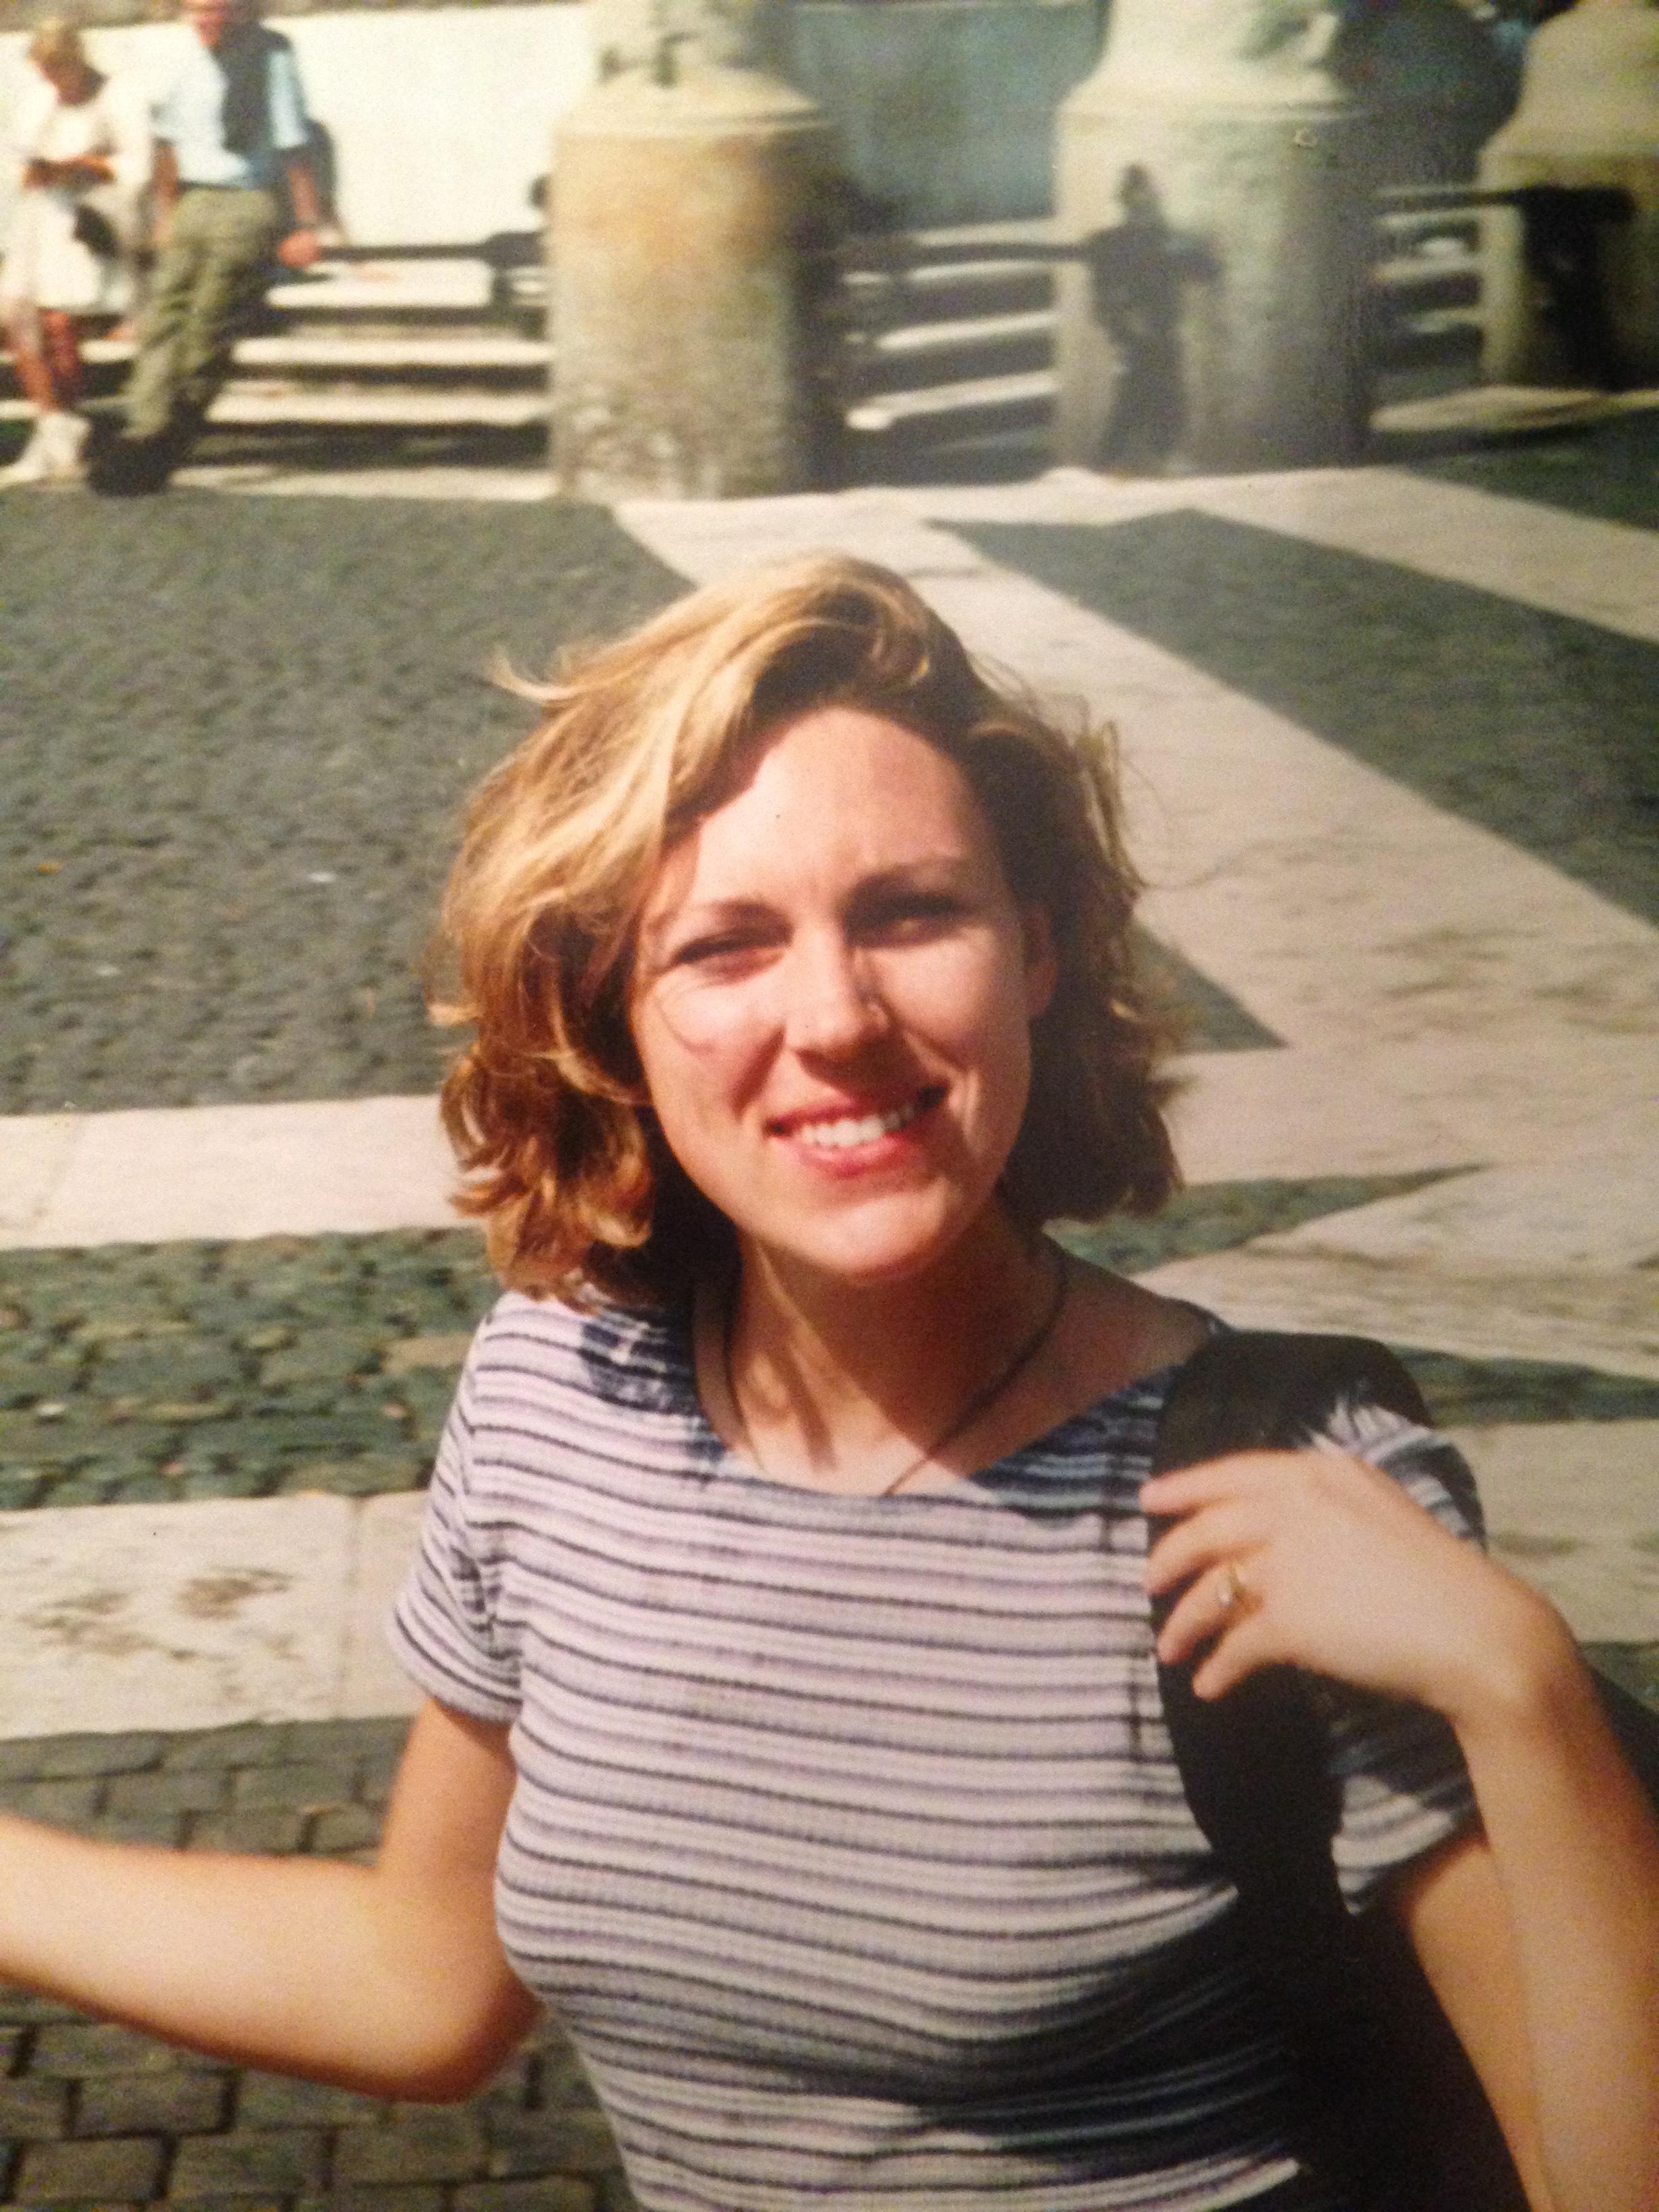 Mum's Blog — Cancer is Pants